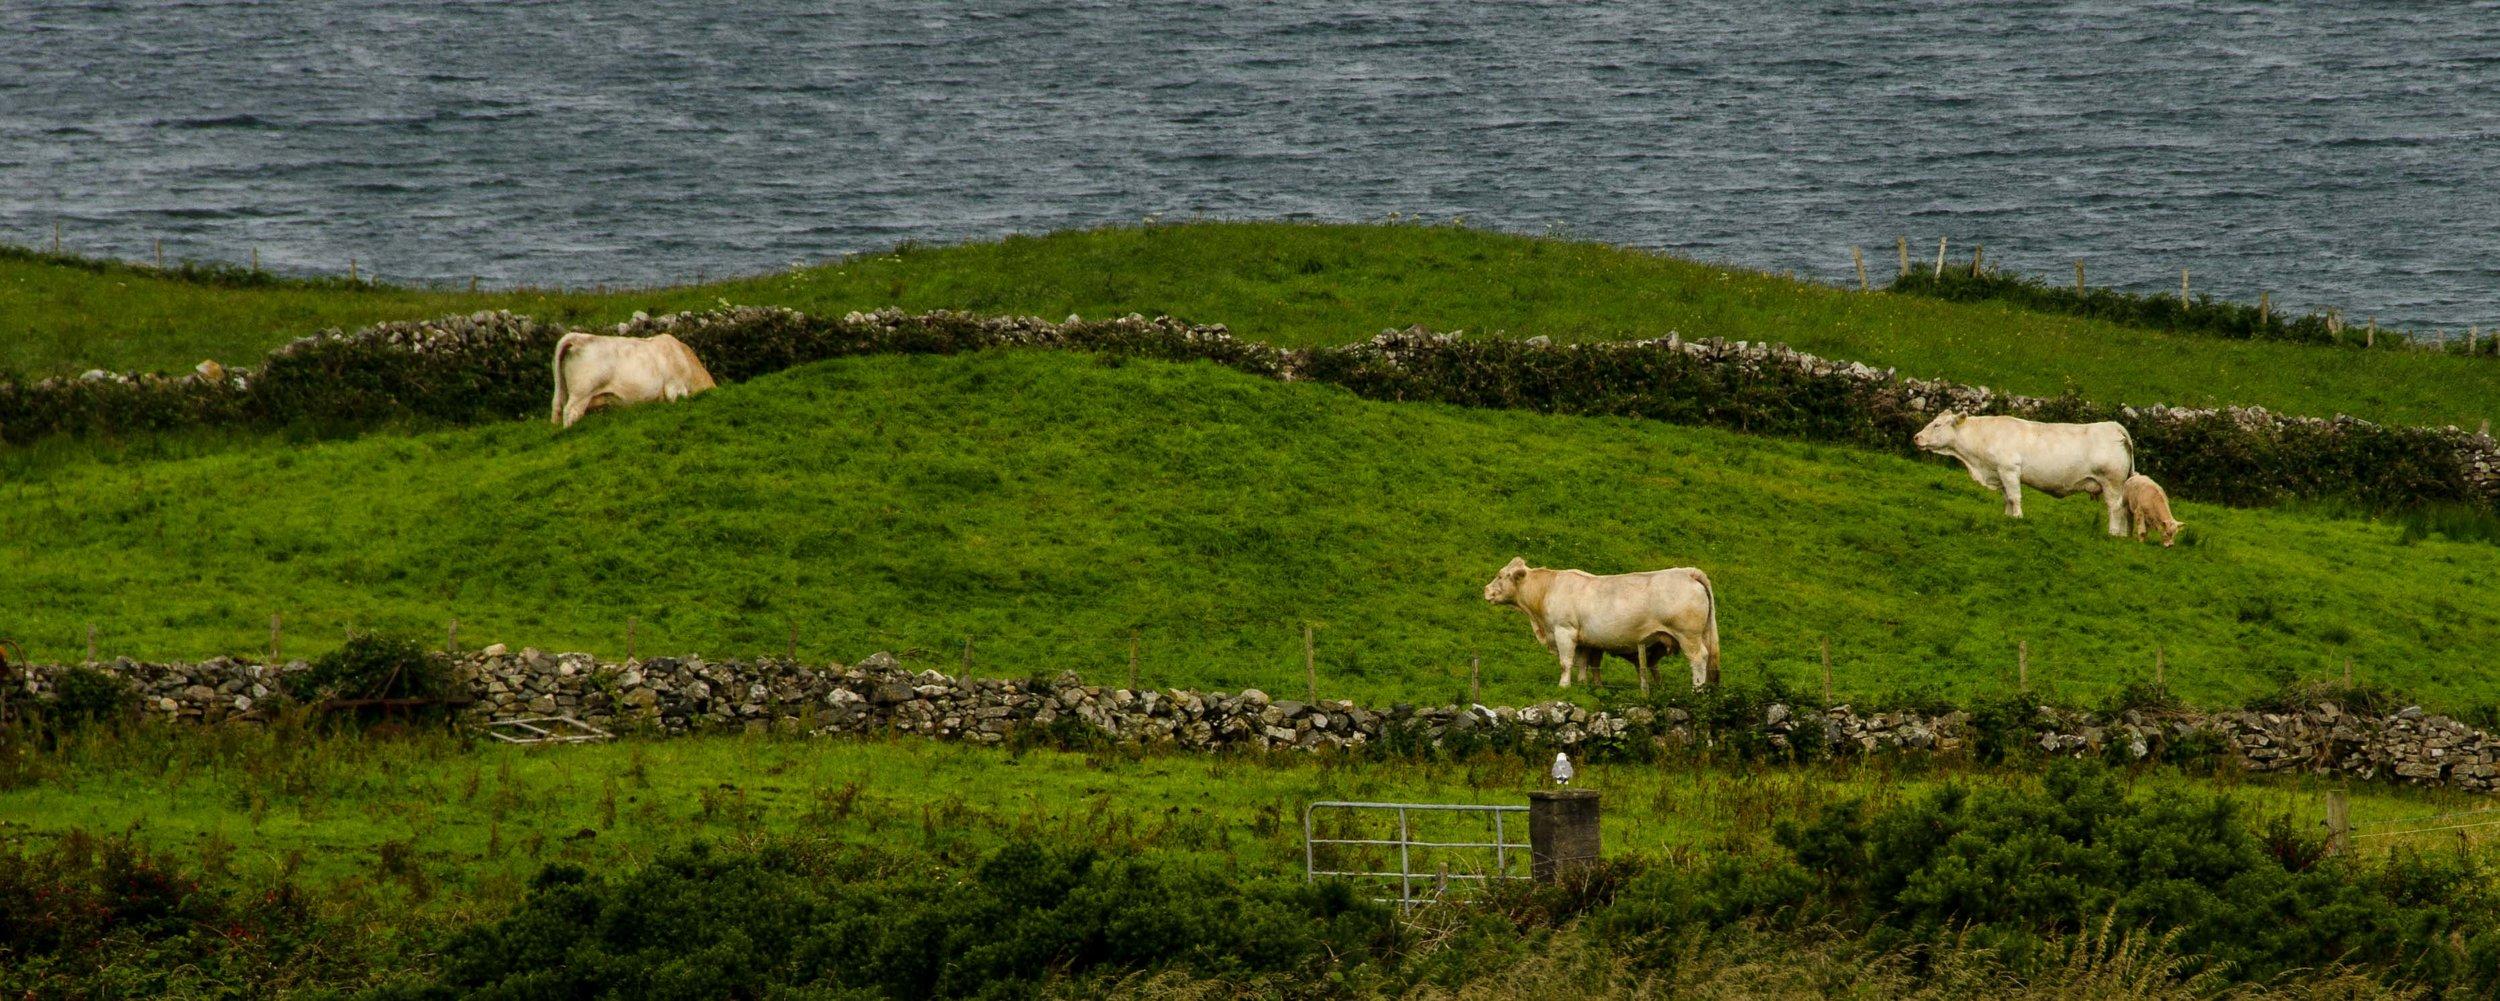 Connemara, Ireland 2015